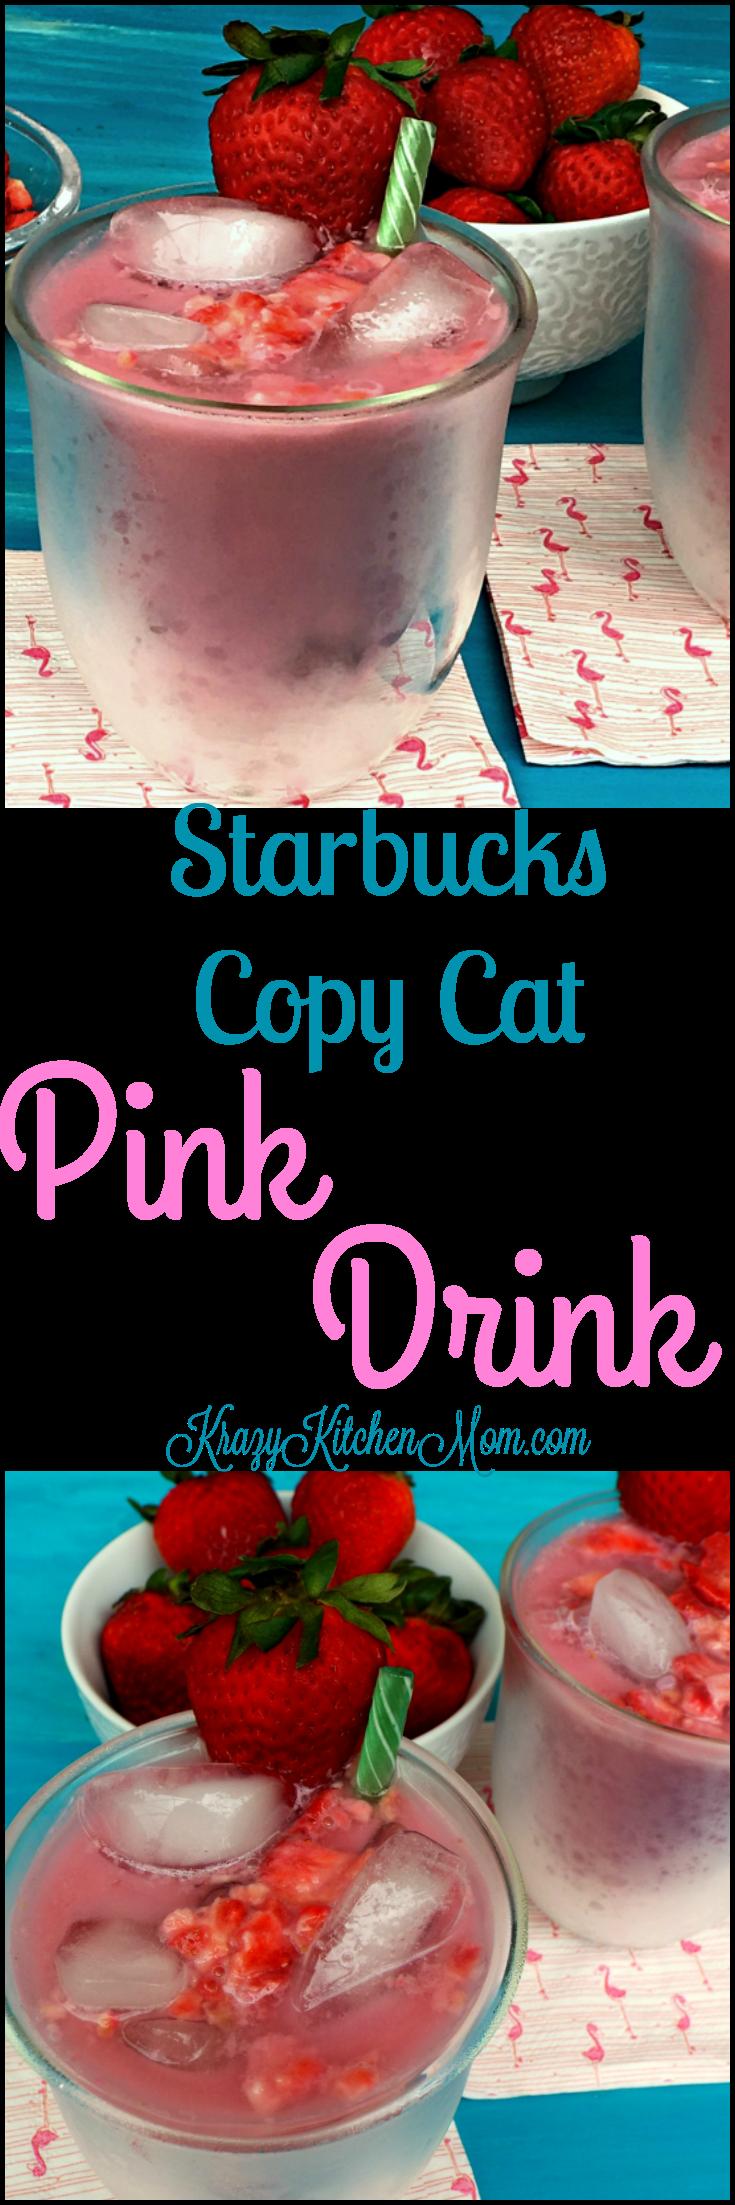 Copy Cat Starbucks Pink Drink Recipe cocktails Pink